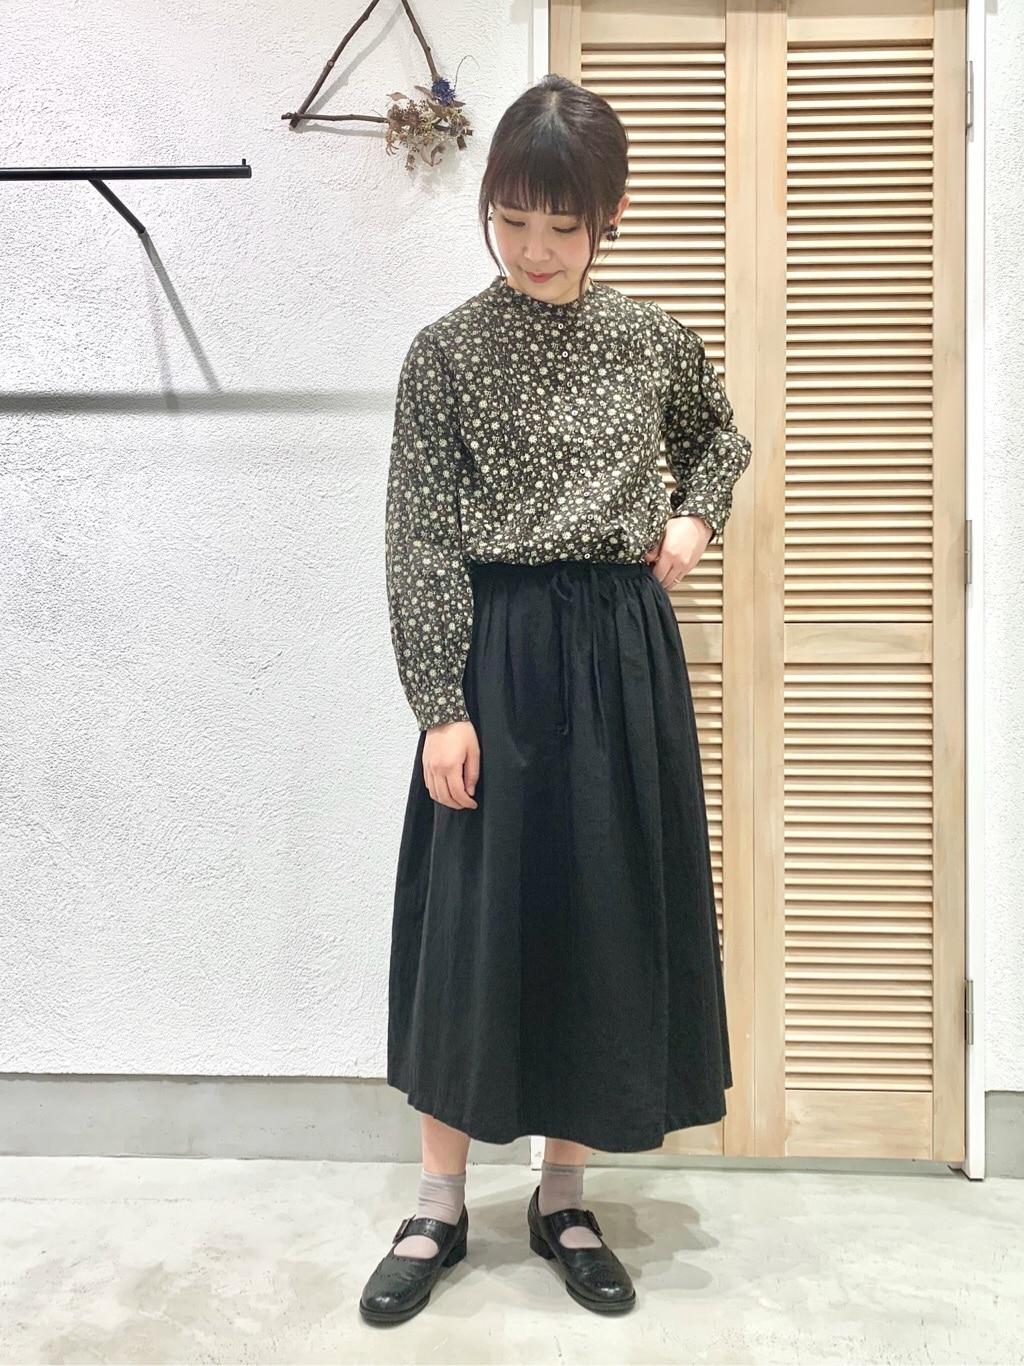 chambre de charme 横浜ジョイナス 身長:162cm 2021.02.26